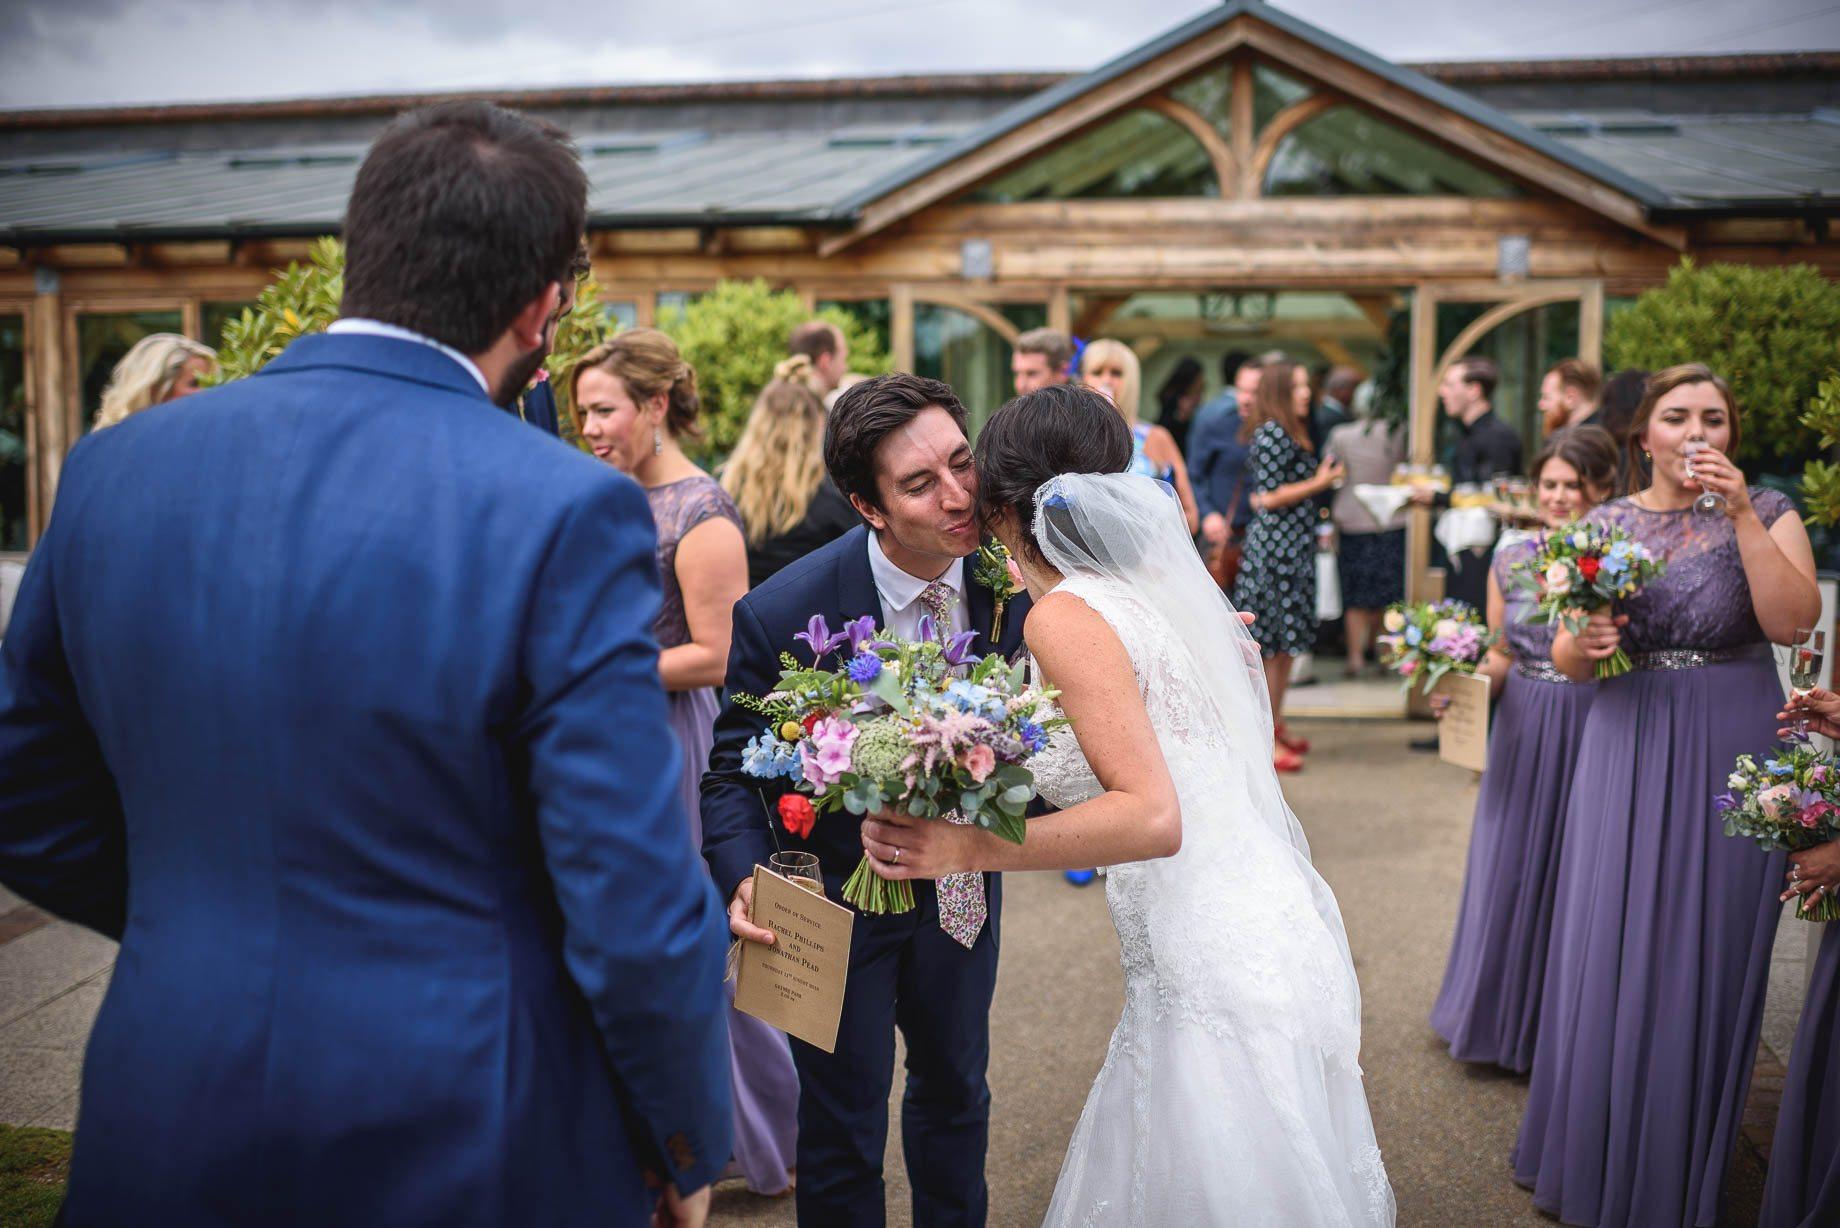 Gaynes Park wedding photography - Guy Collier Photography - Rachel and Jon (76 of 169)